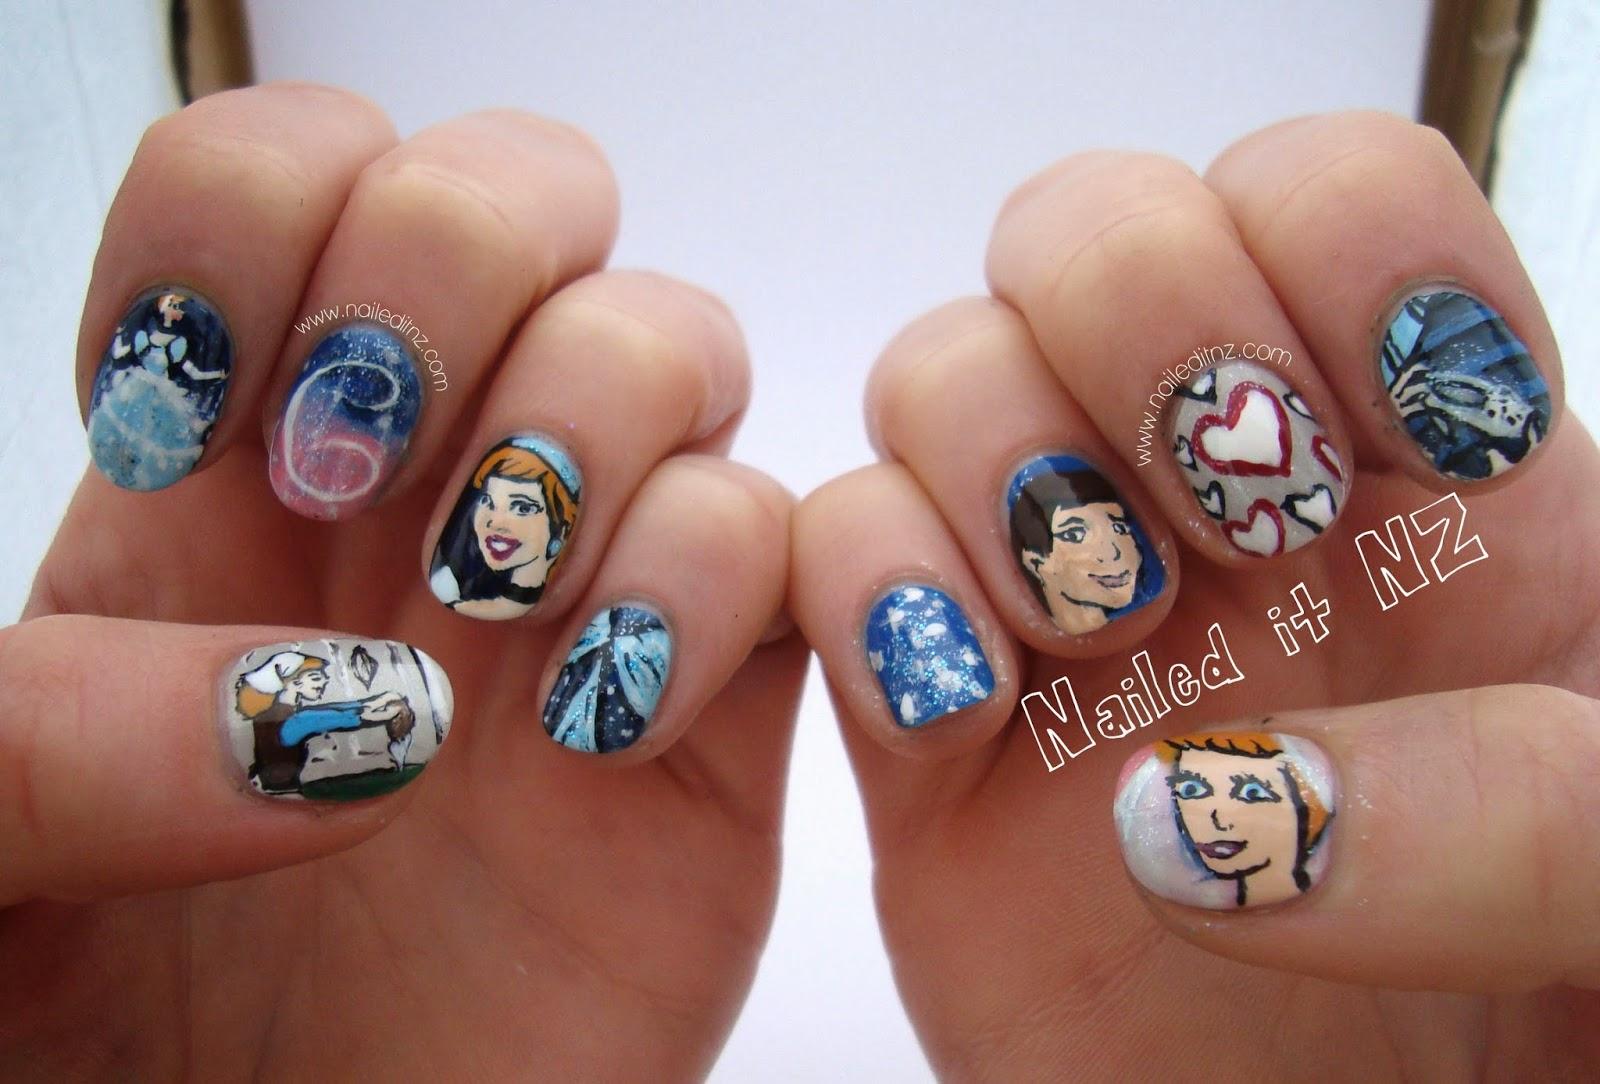 Disney Nail Art #3 - Cinderella!